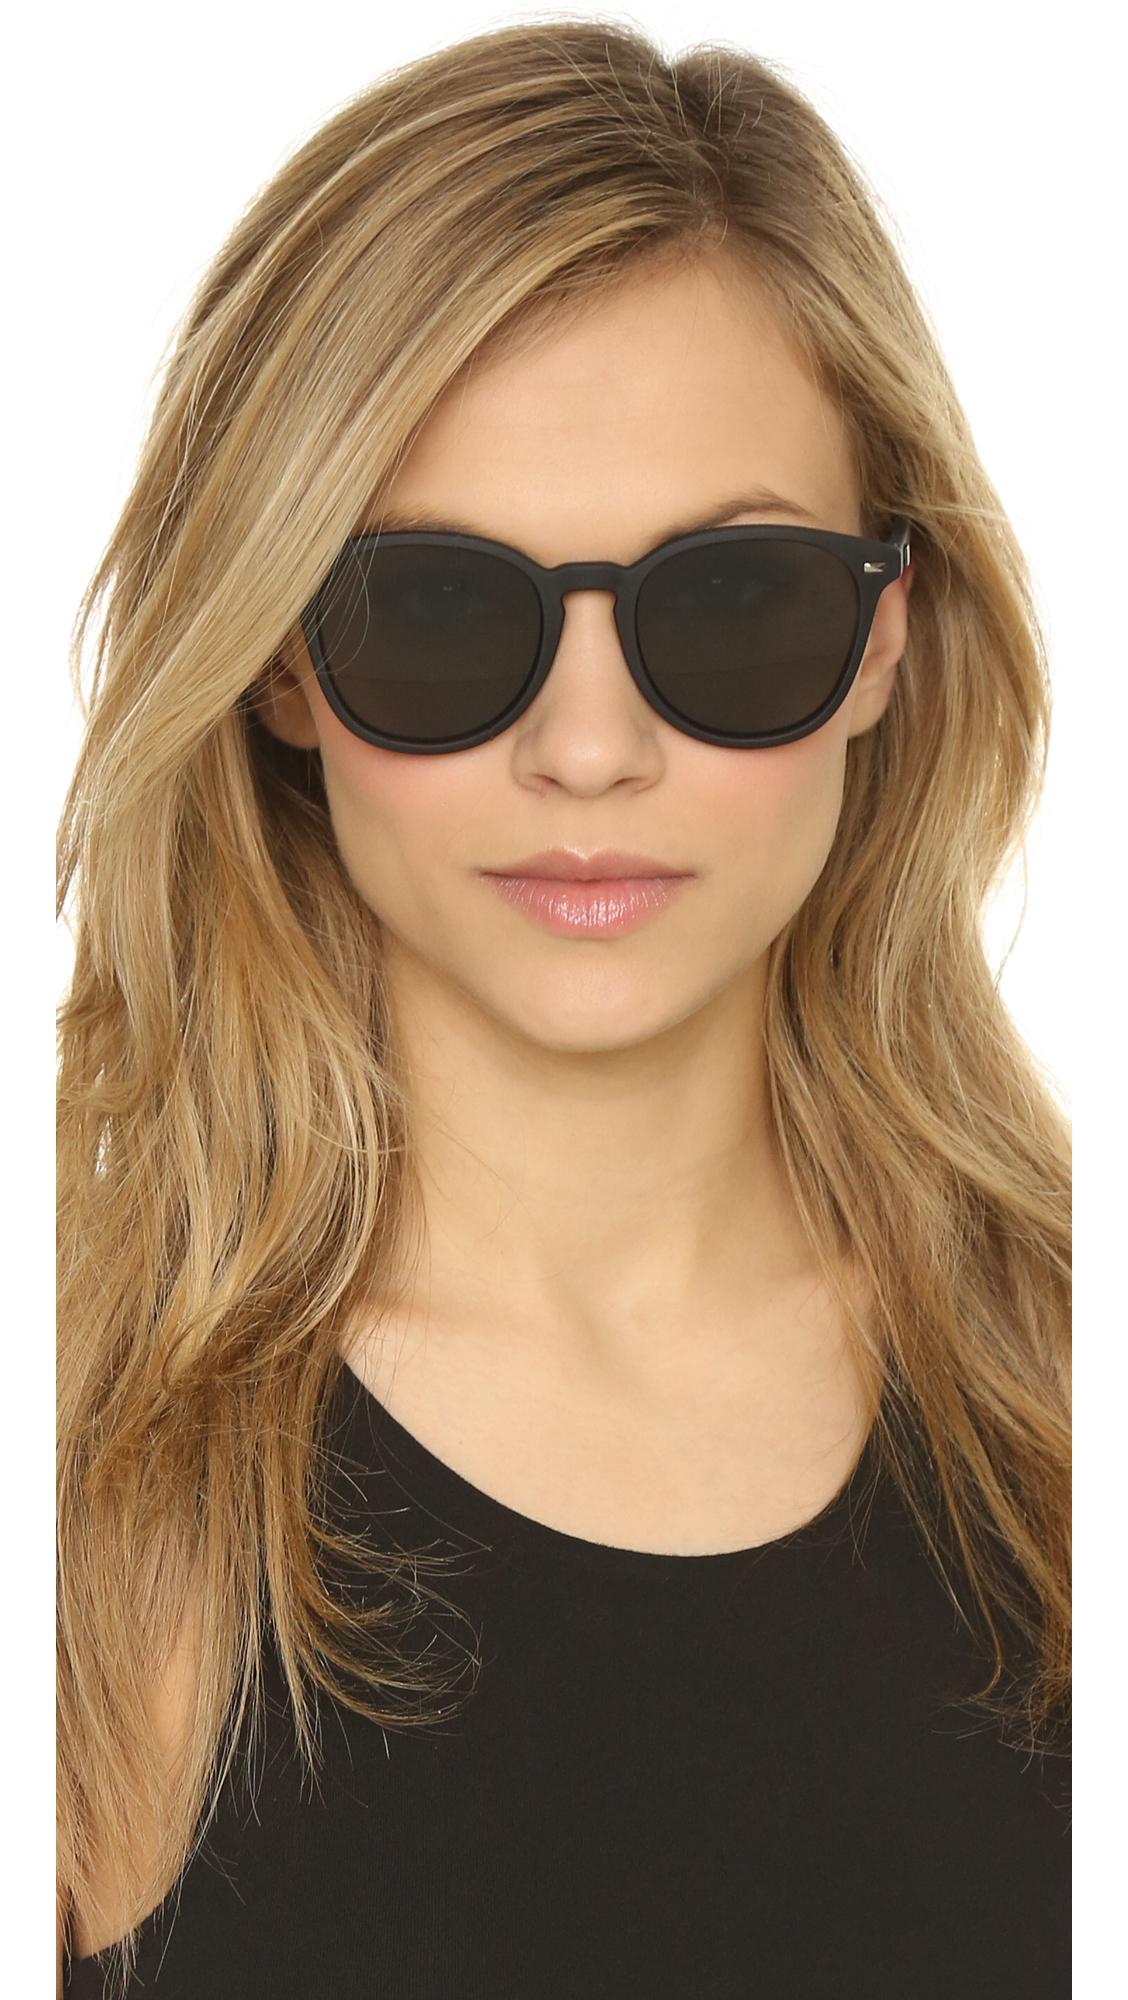 Le Specs Bandwagon Sunglasses In Black Black Rubber Khaki